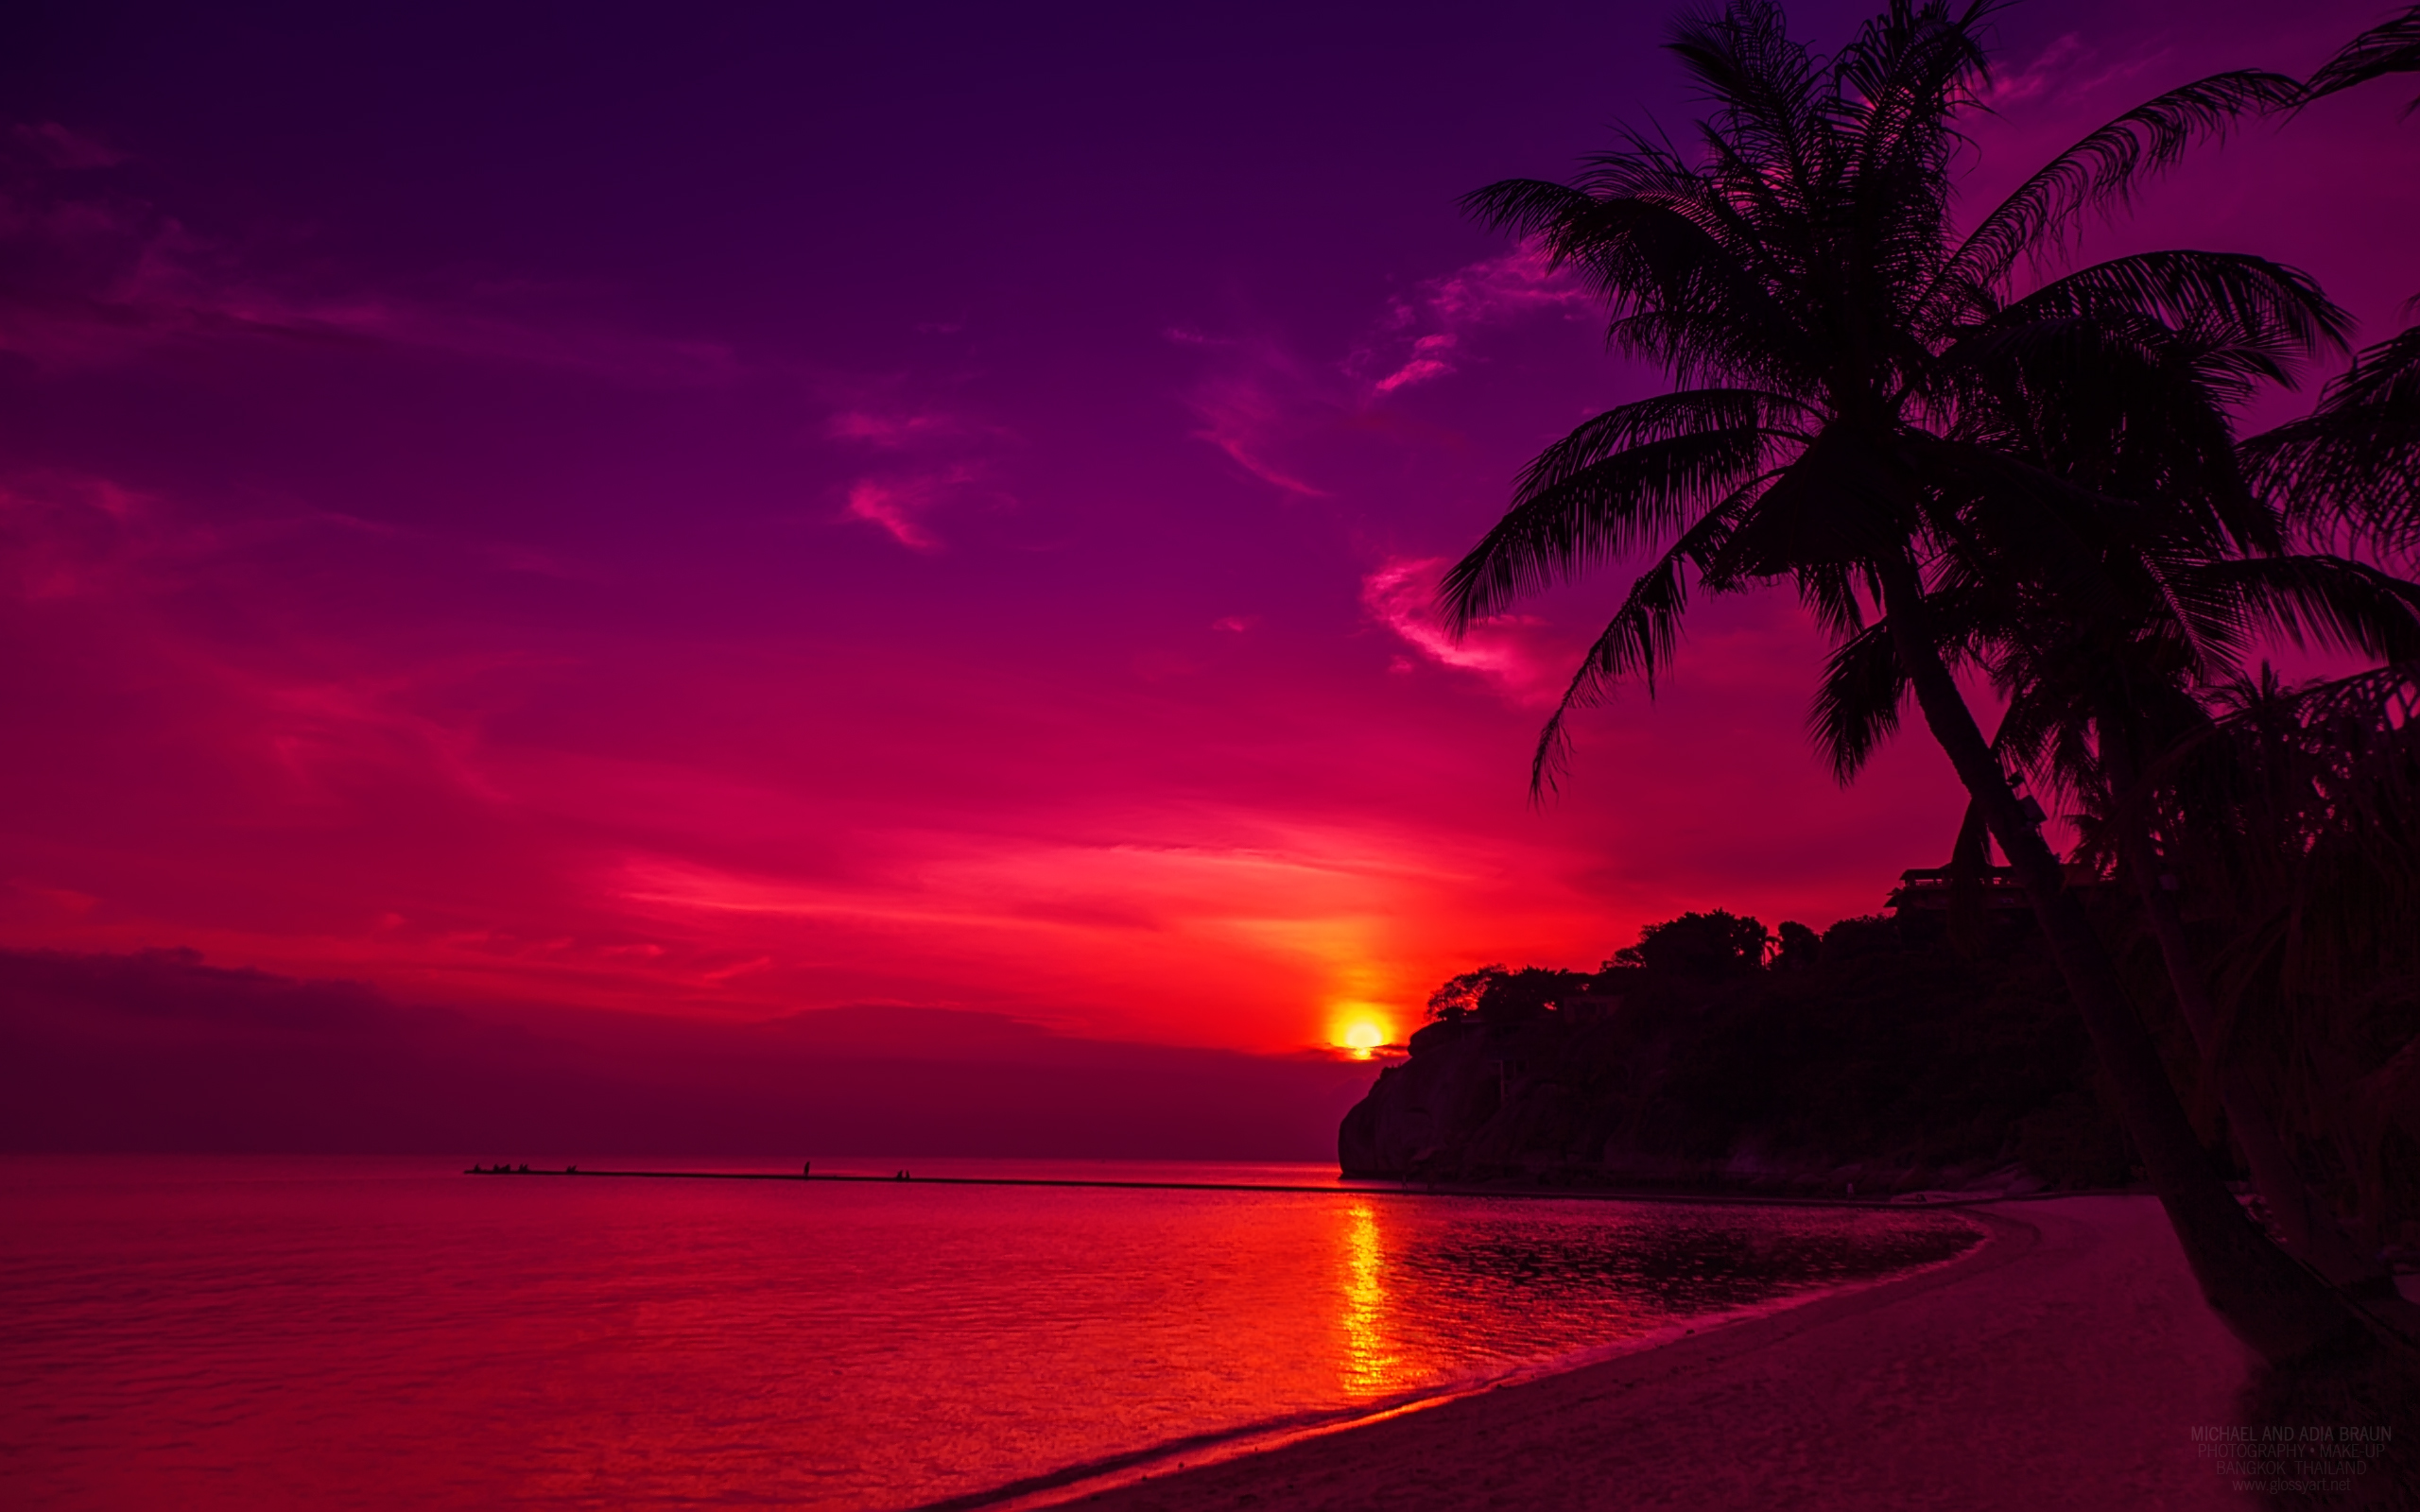 Thailand Beach Sunset Wallpapers HD Wallpapers 2560x1600